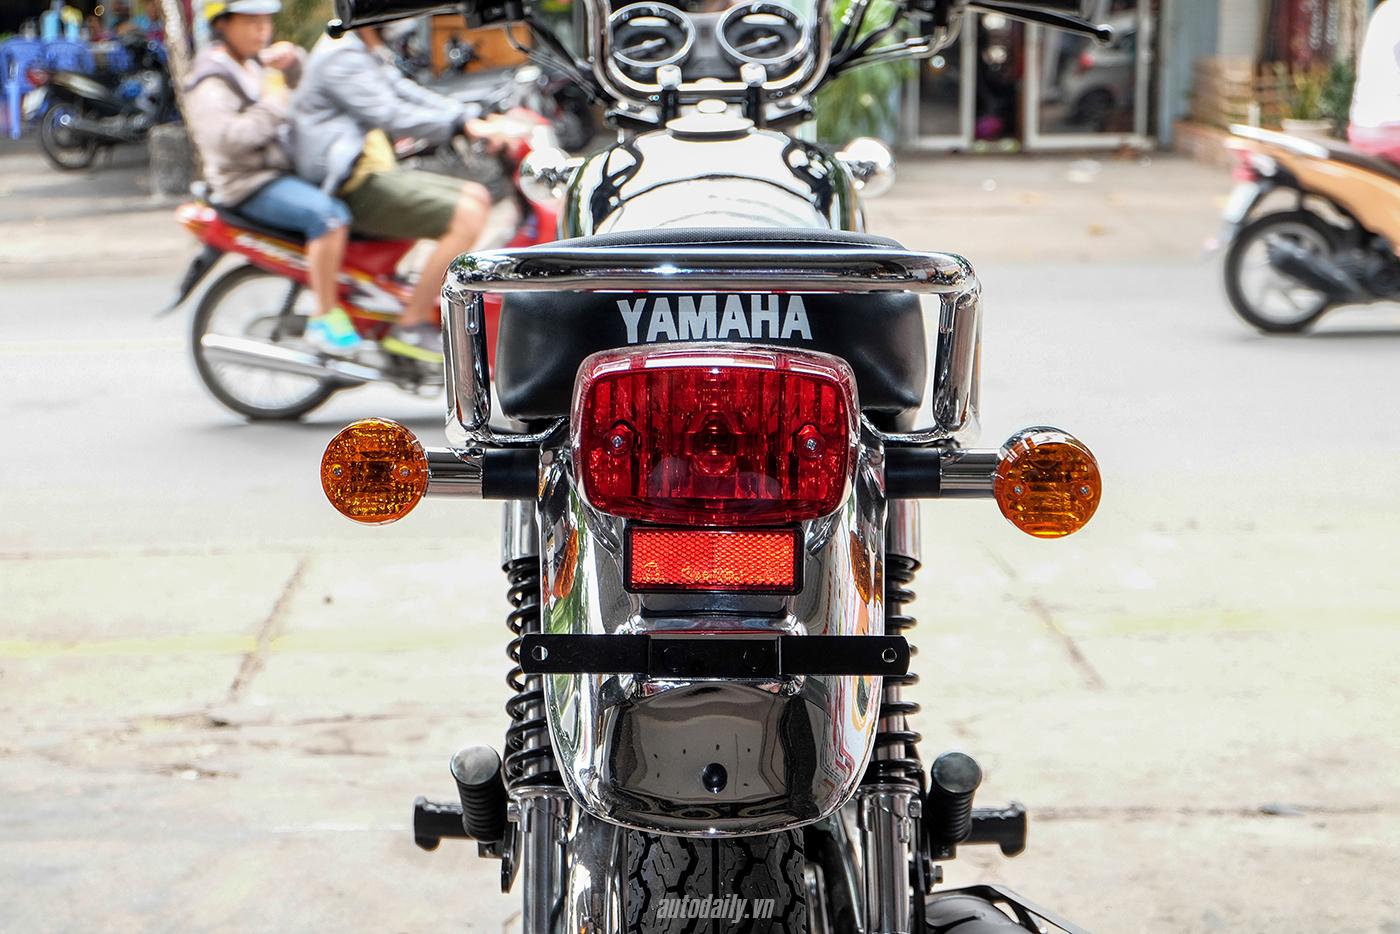 yamaha-yb125-sp-11.jpg